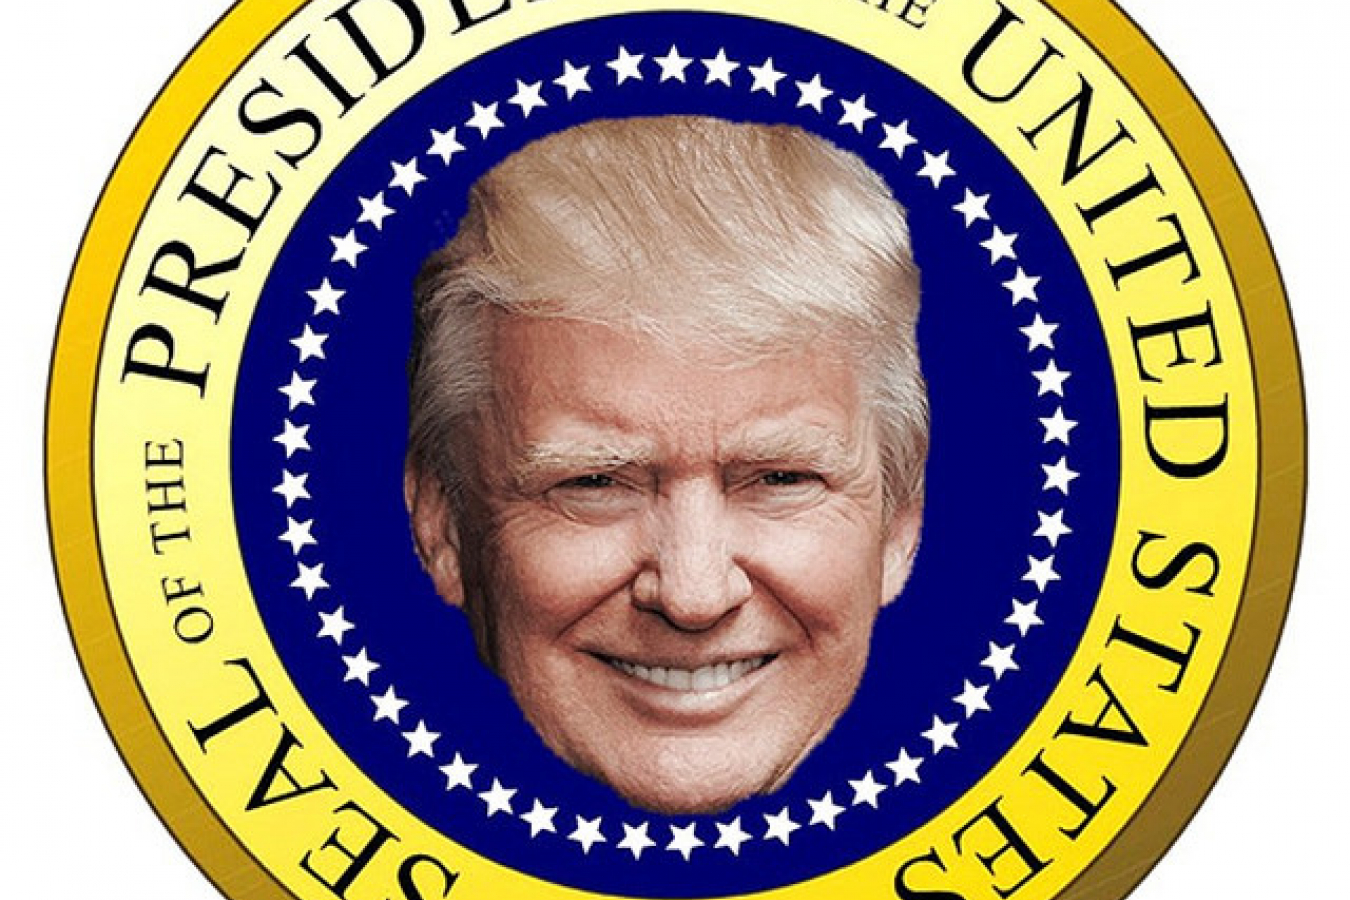 President Trump Seal